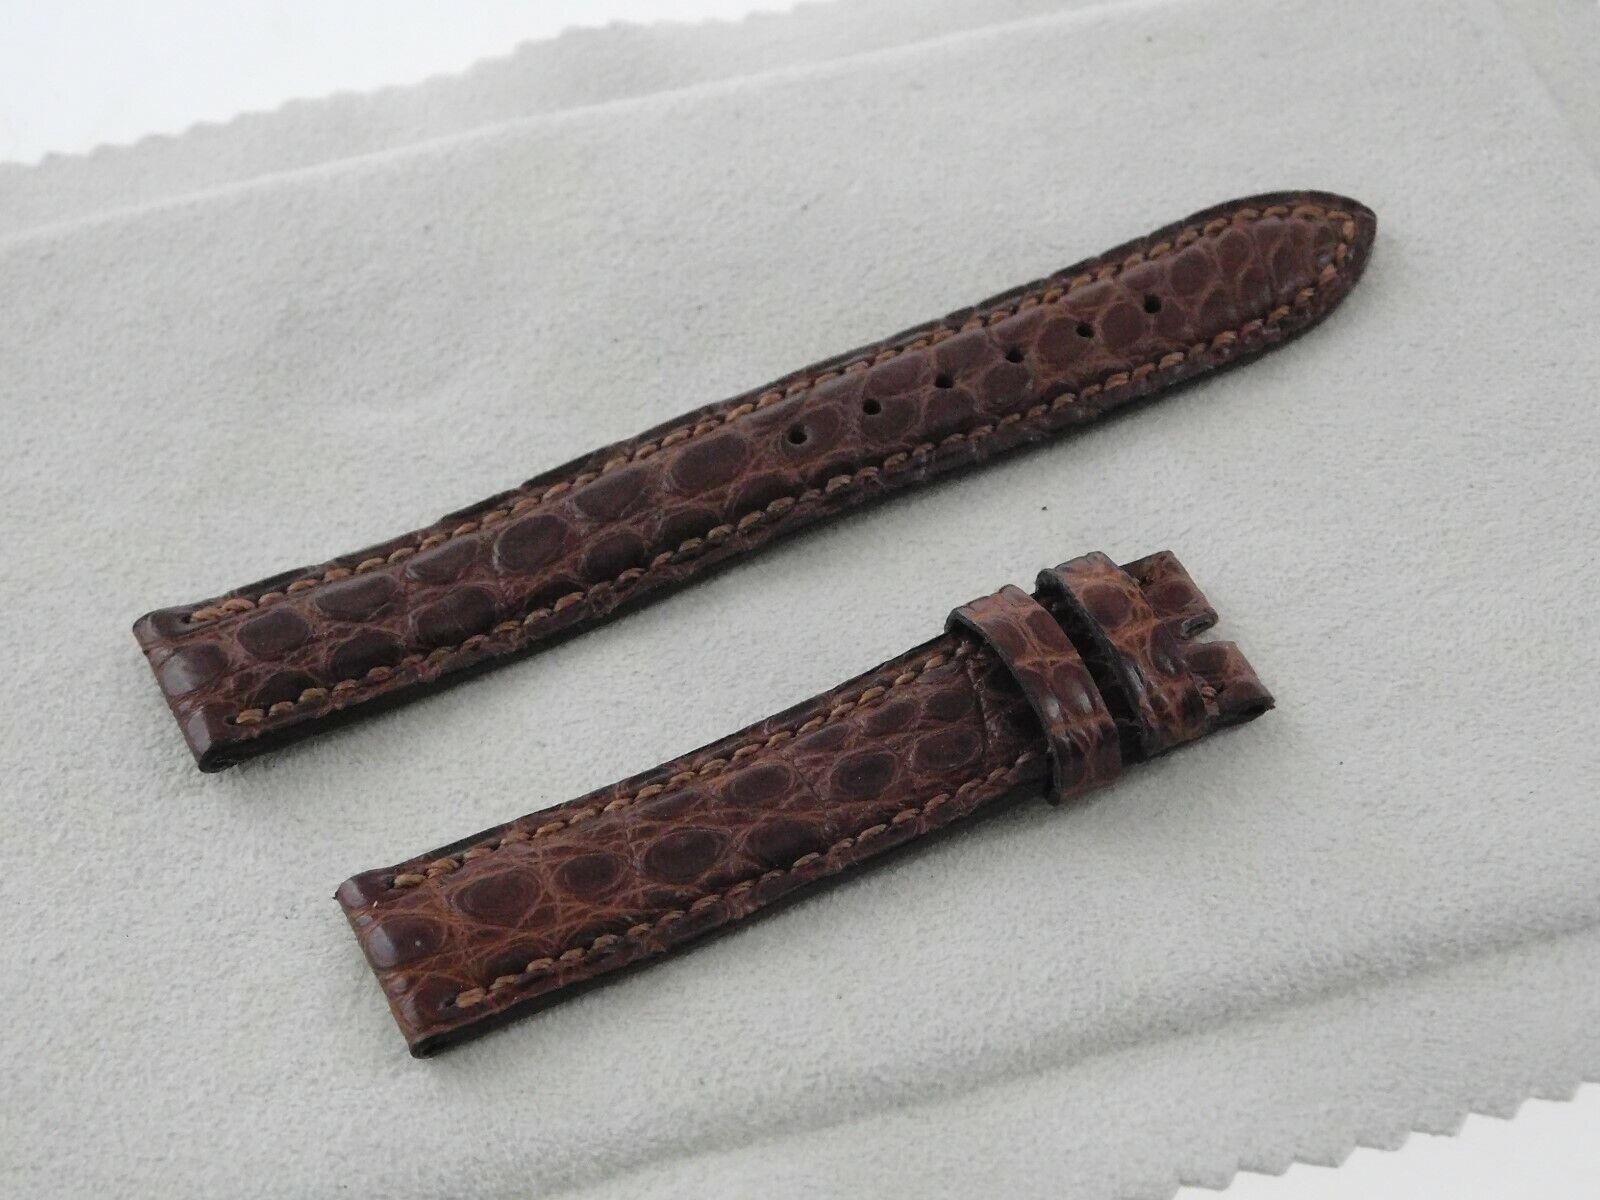 Ungetragen Original BULGARI / BVLGARI Louisiana Kroko Armband 14 mm